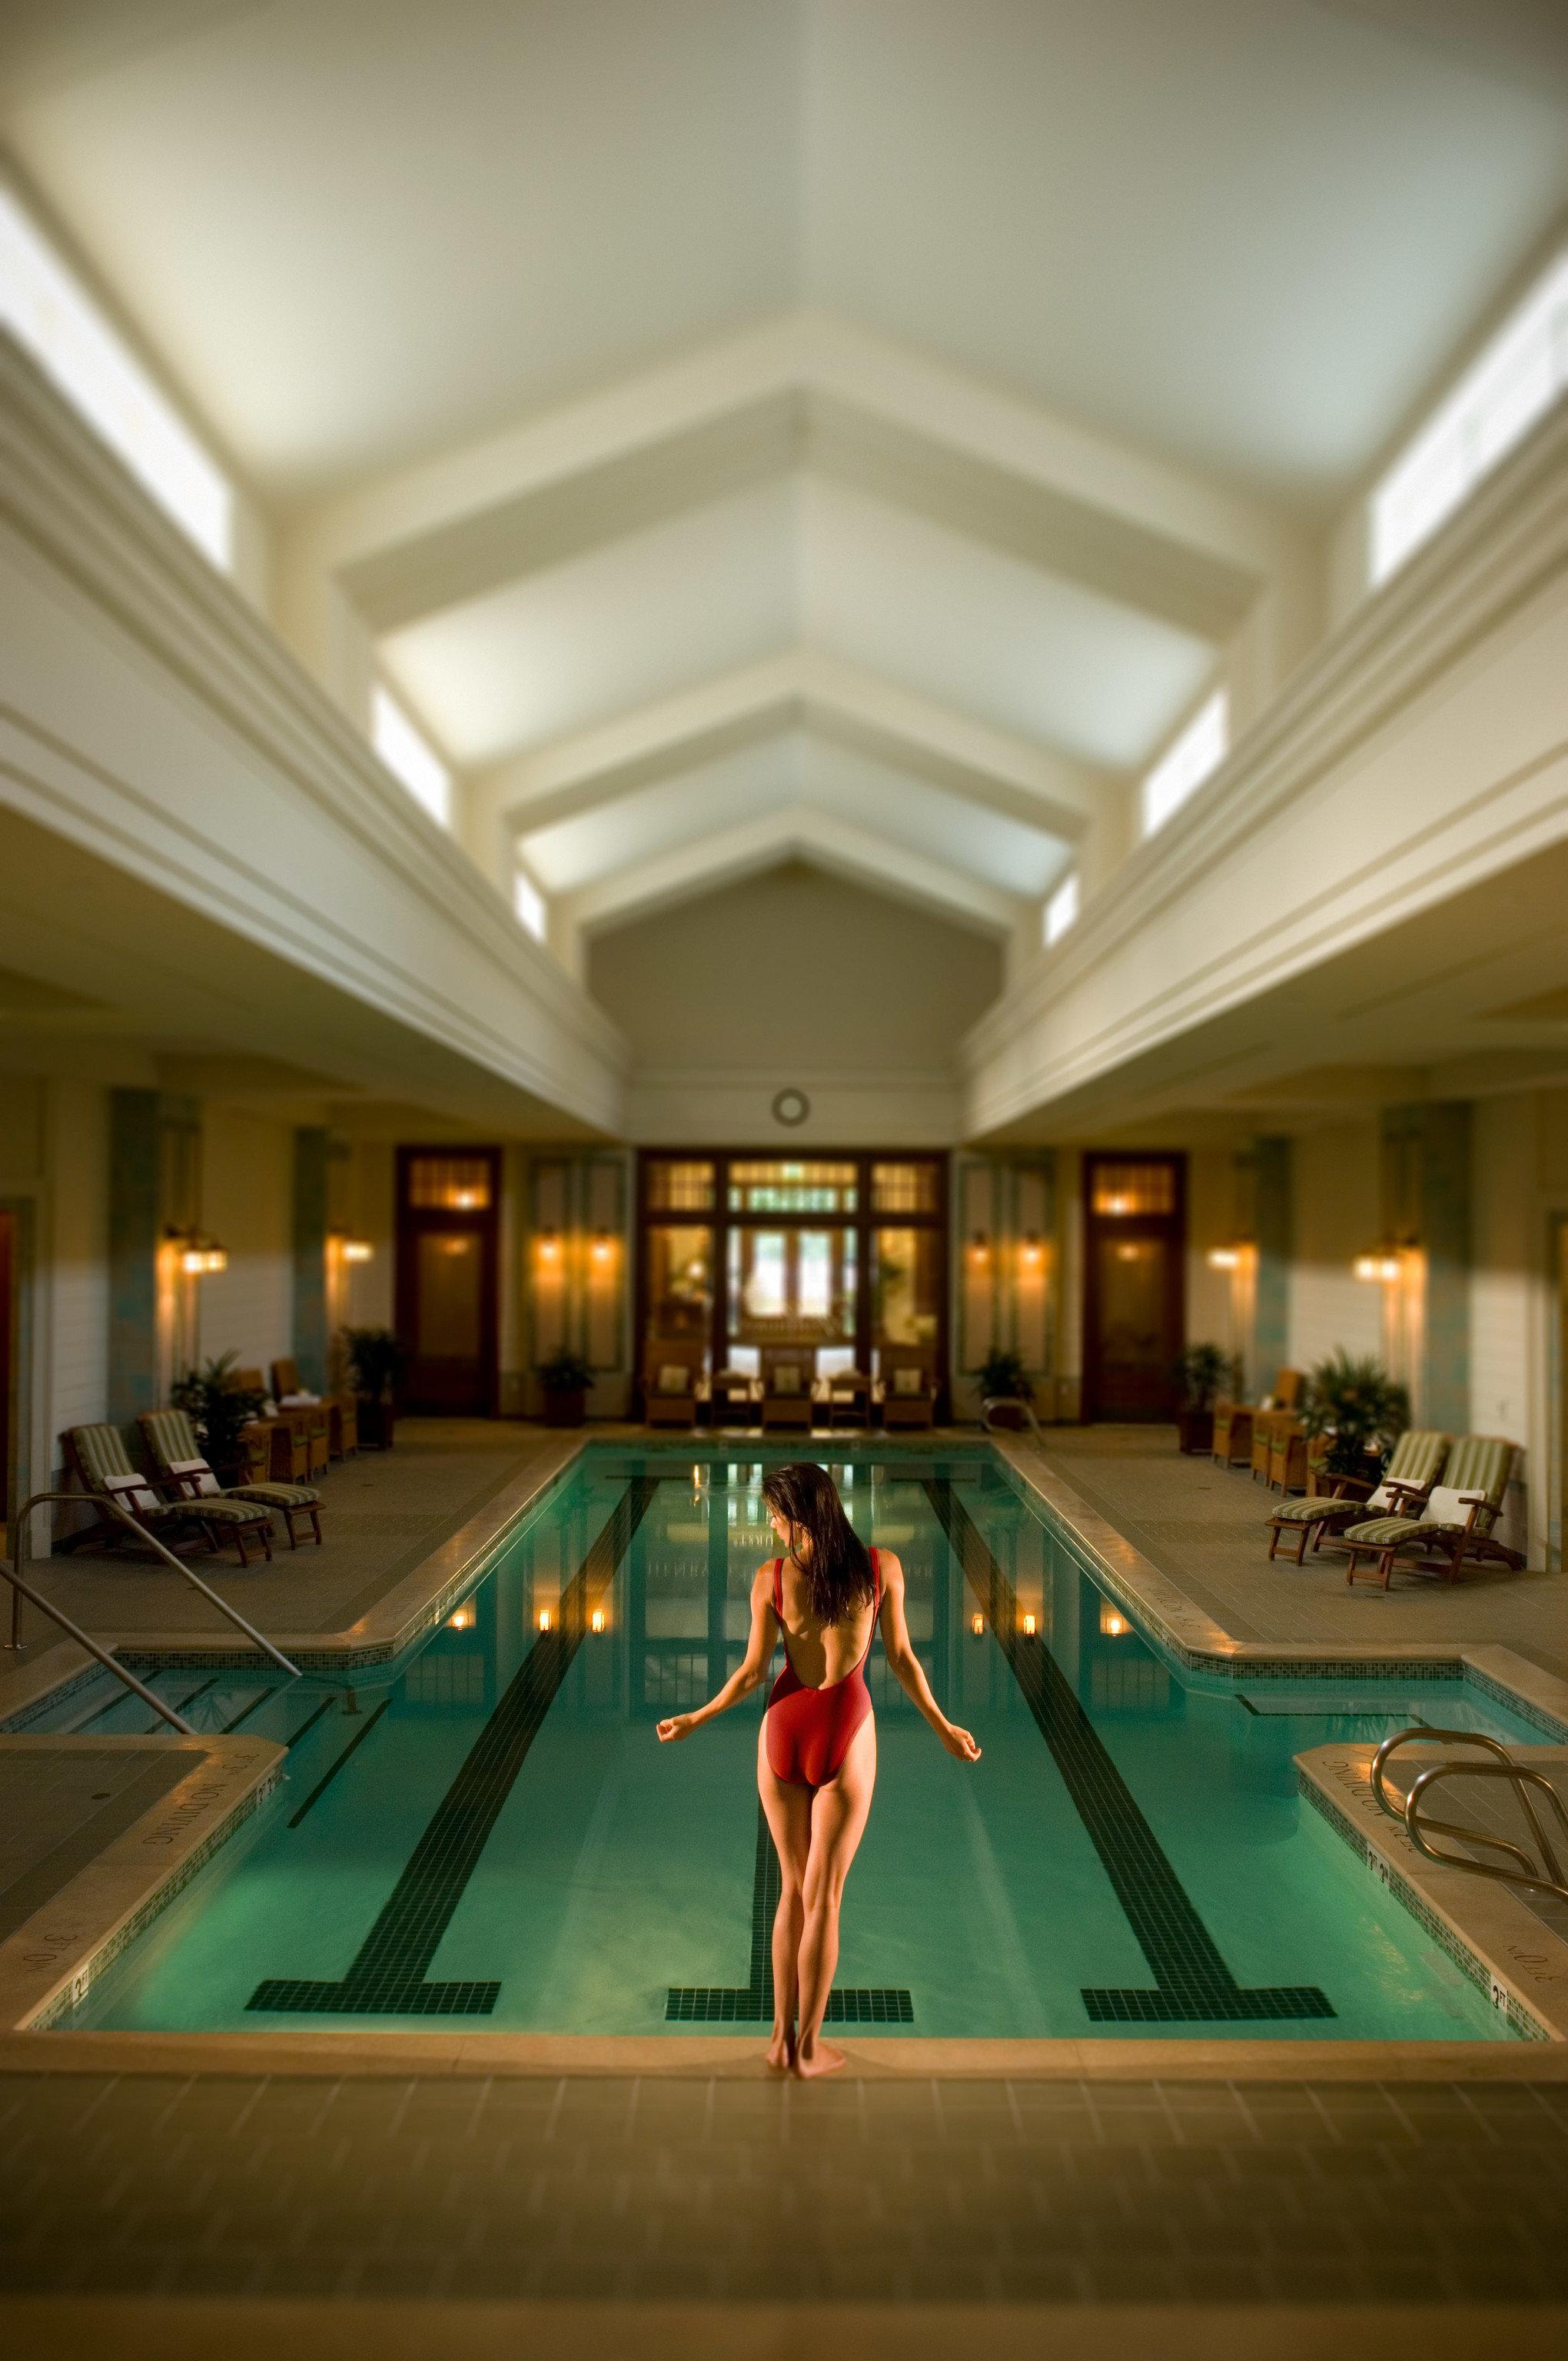 leisure billiard room recreation room swimming pool games